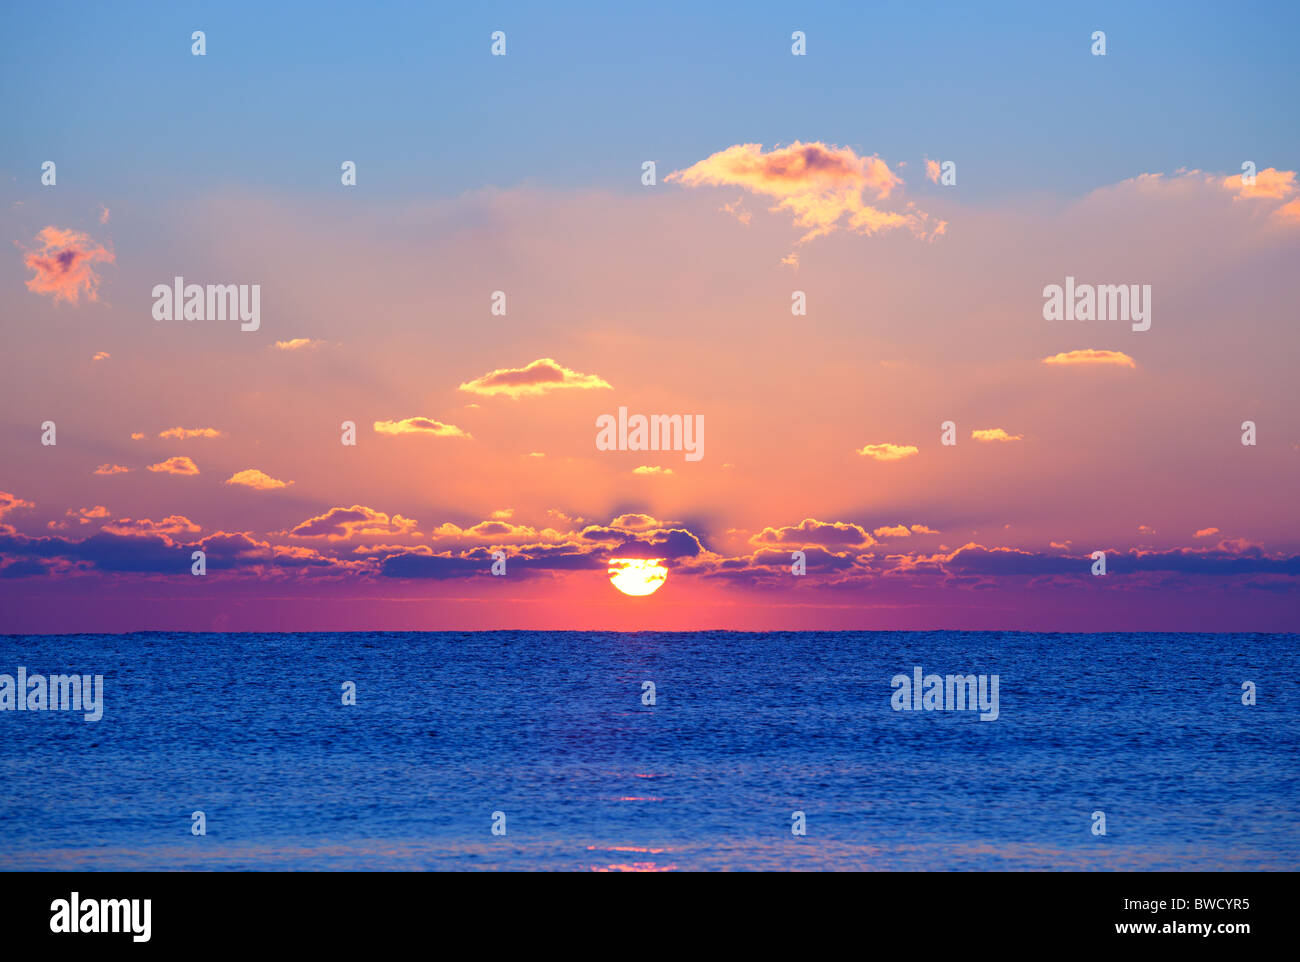 Red rising sun above the dark blue sea - Stock Image